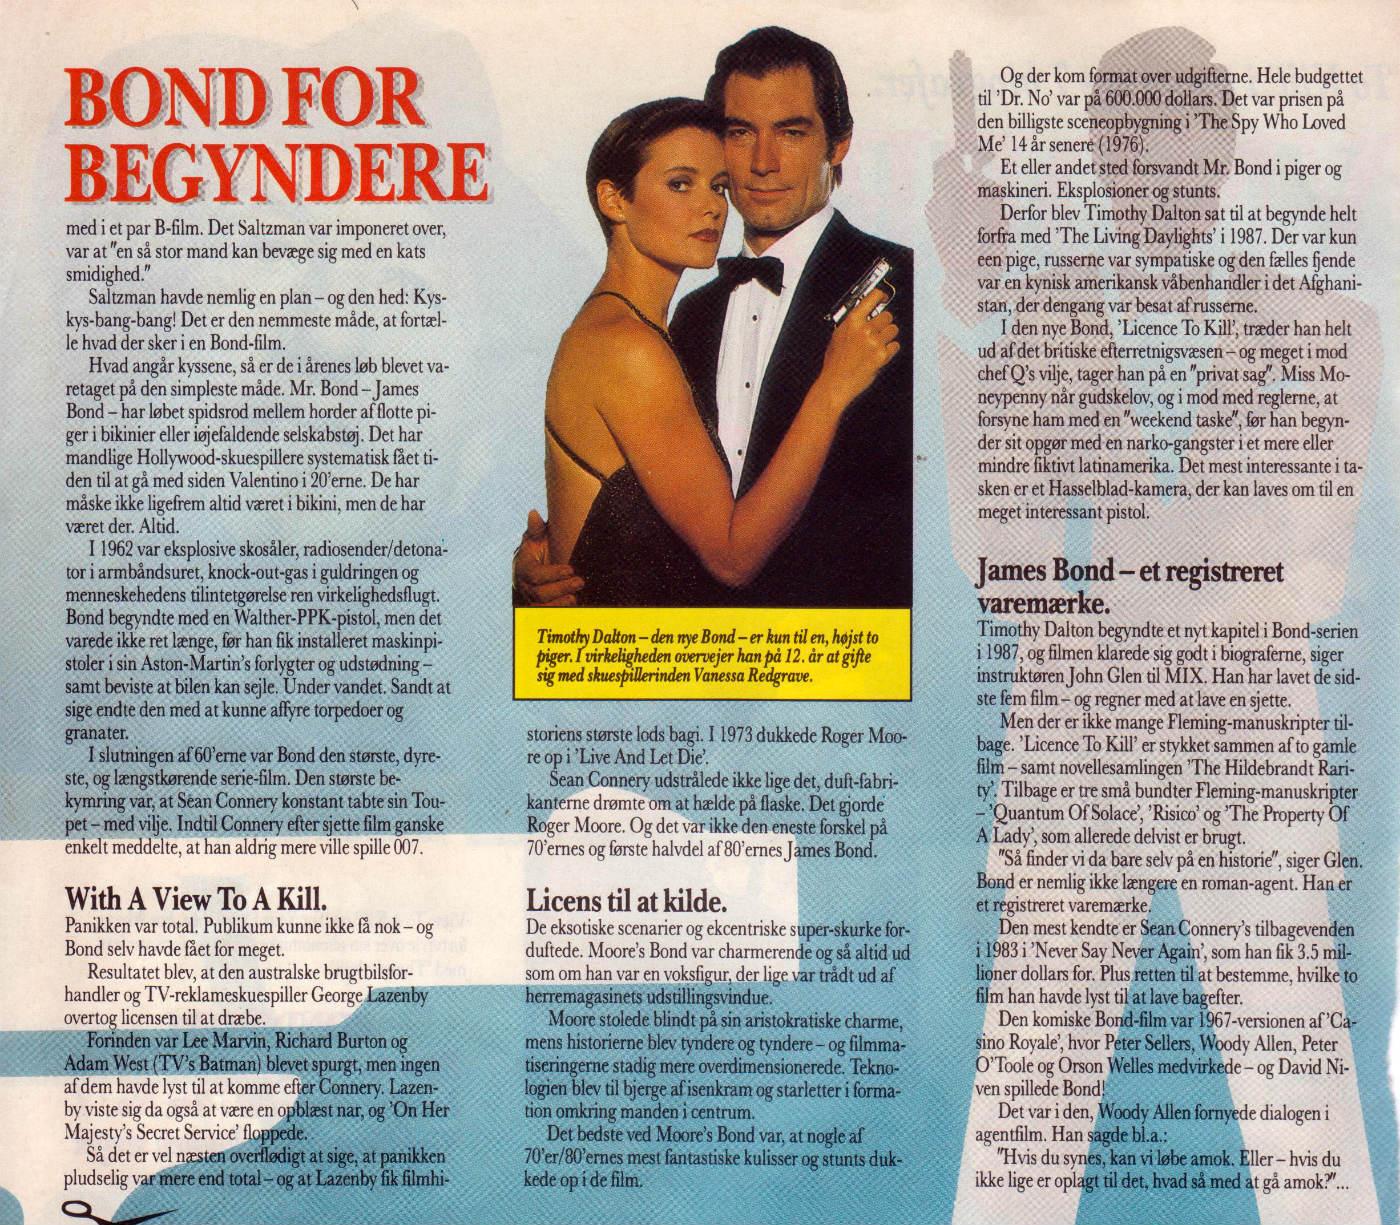 Bond for begyndere - MIX 1989 C